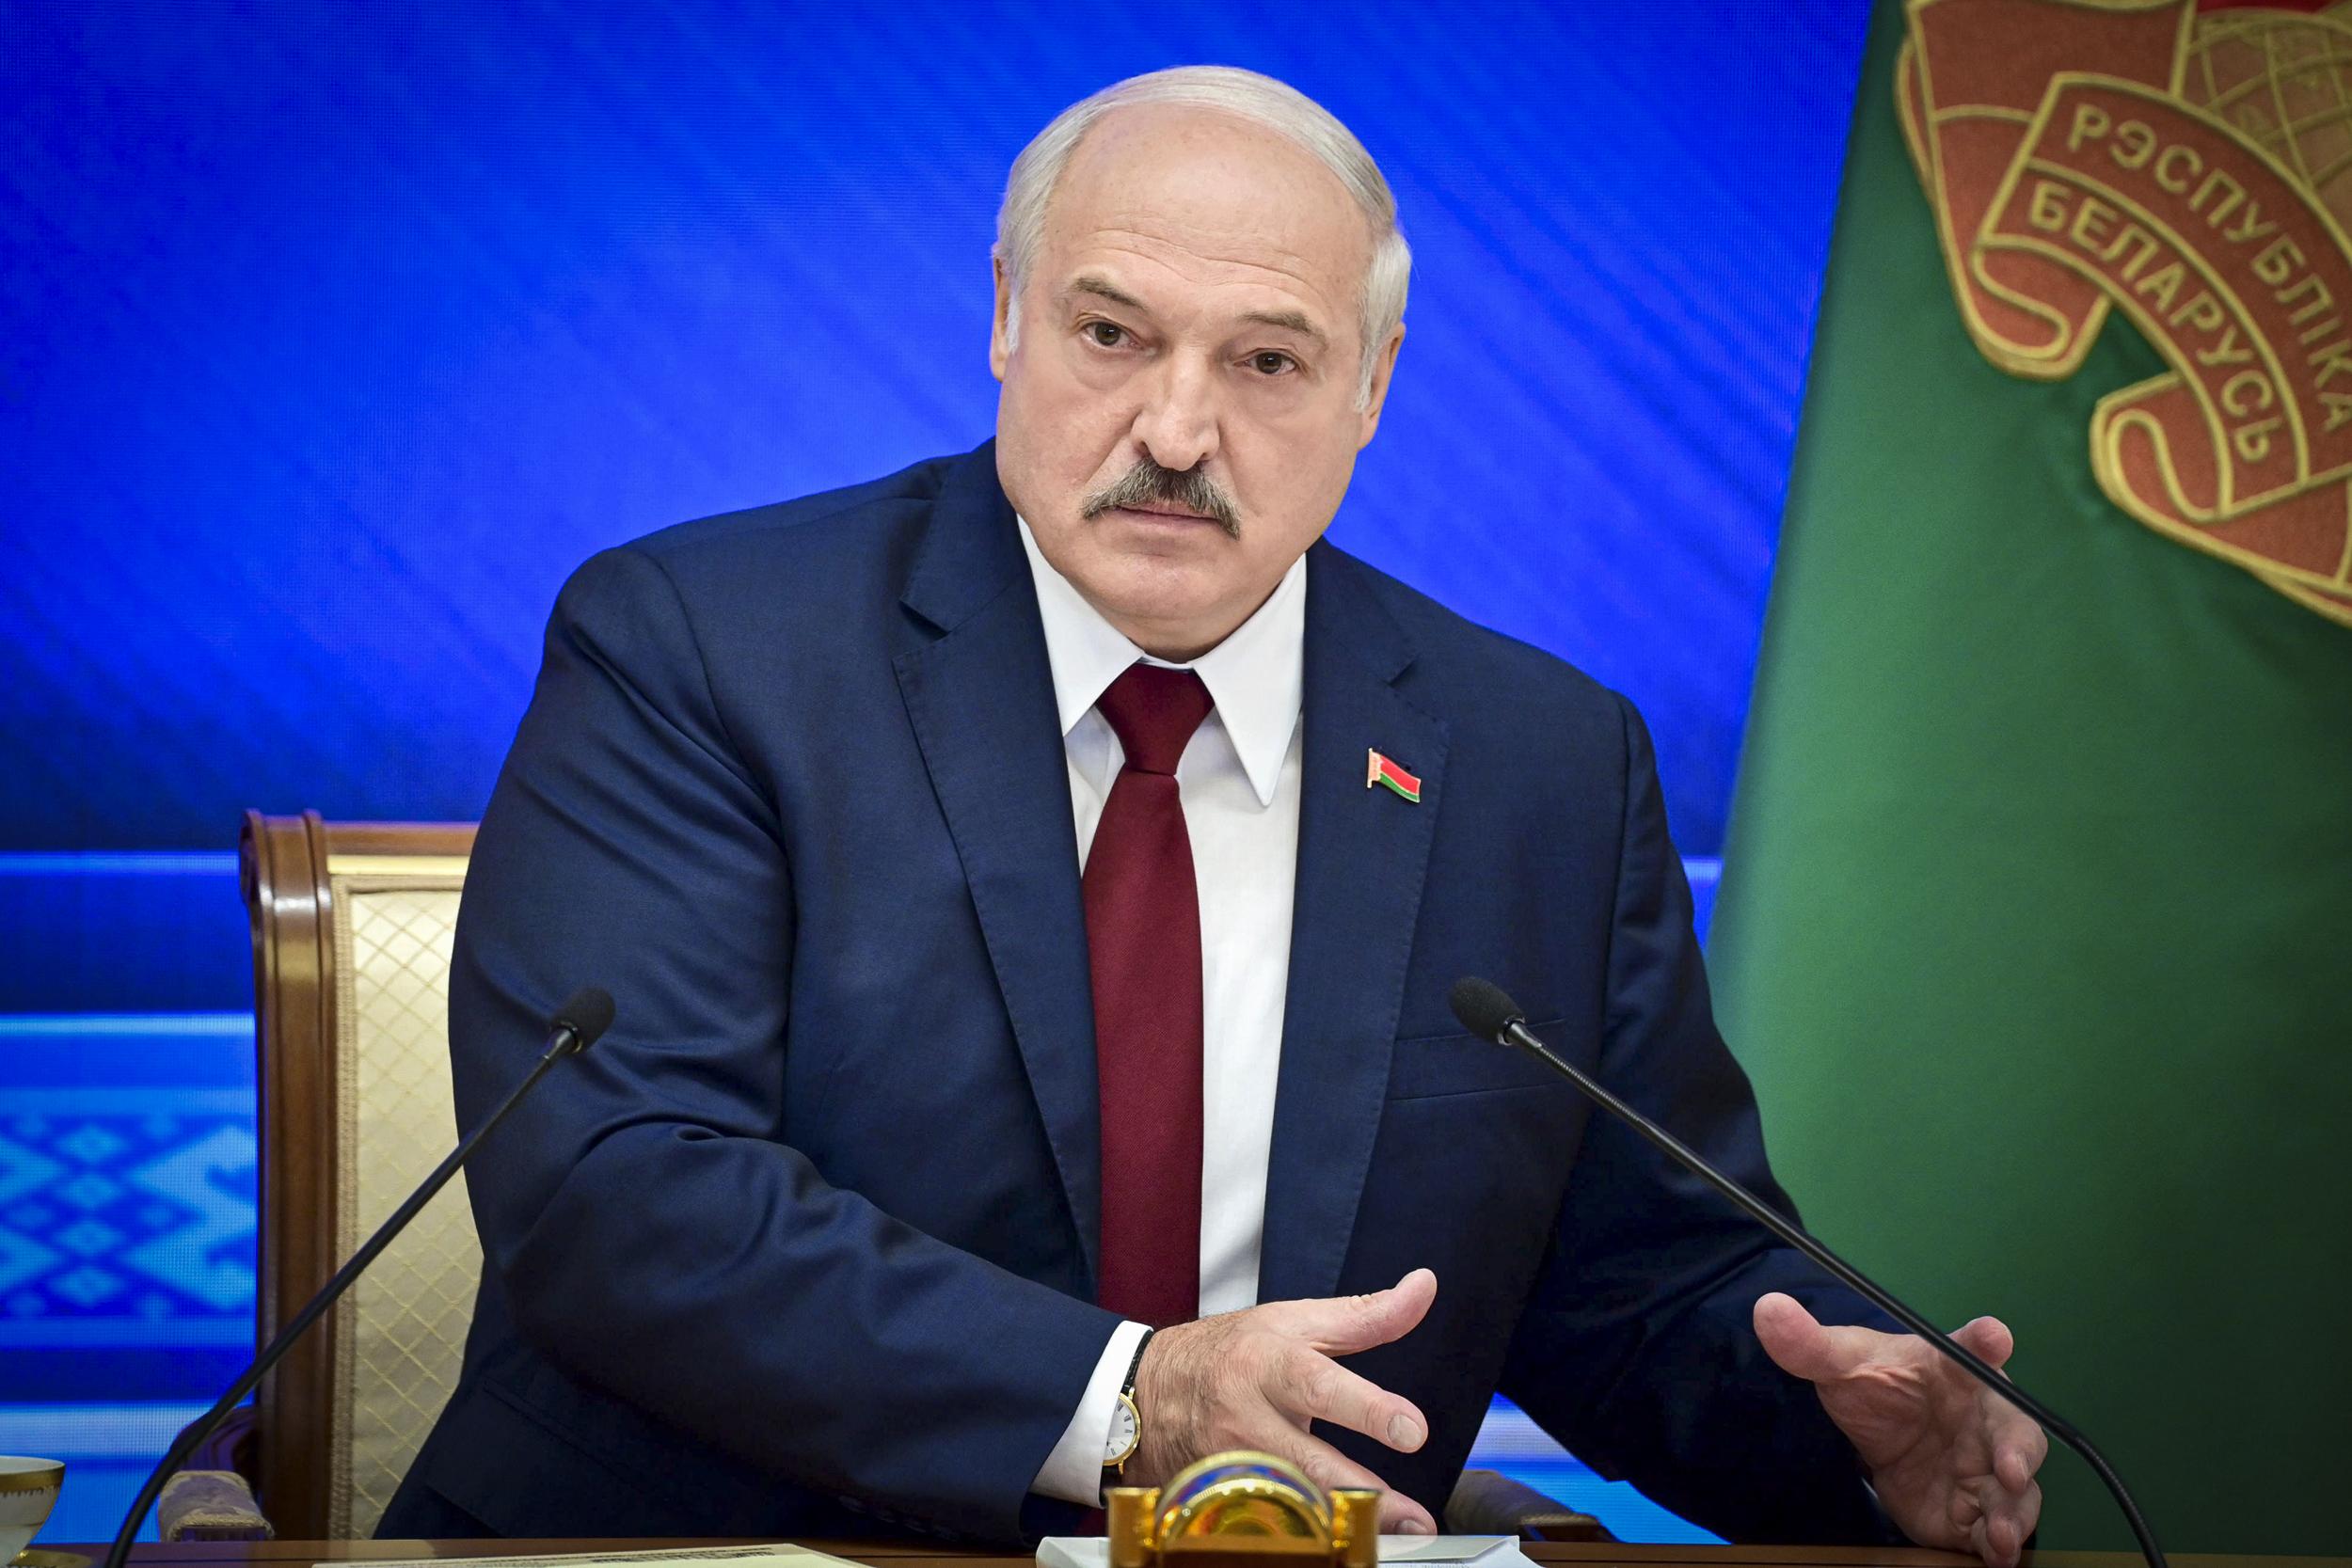 Biden pushes sanctions against Belarus' Lukashenko regime